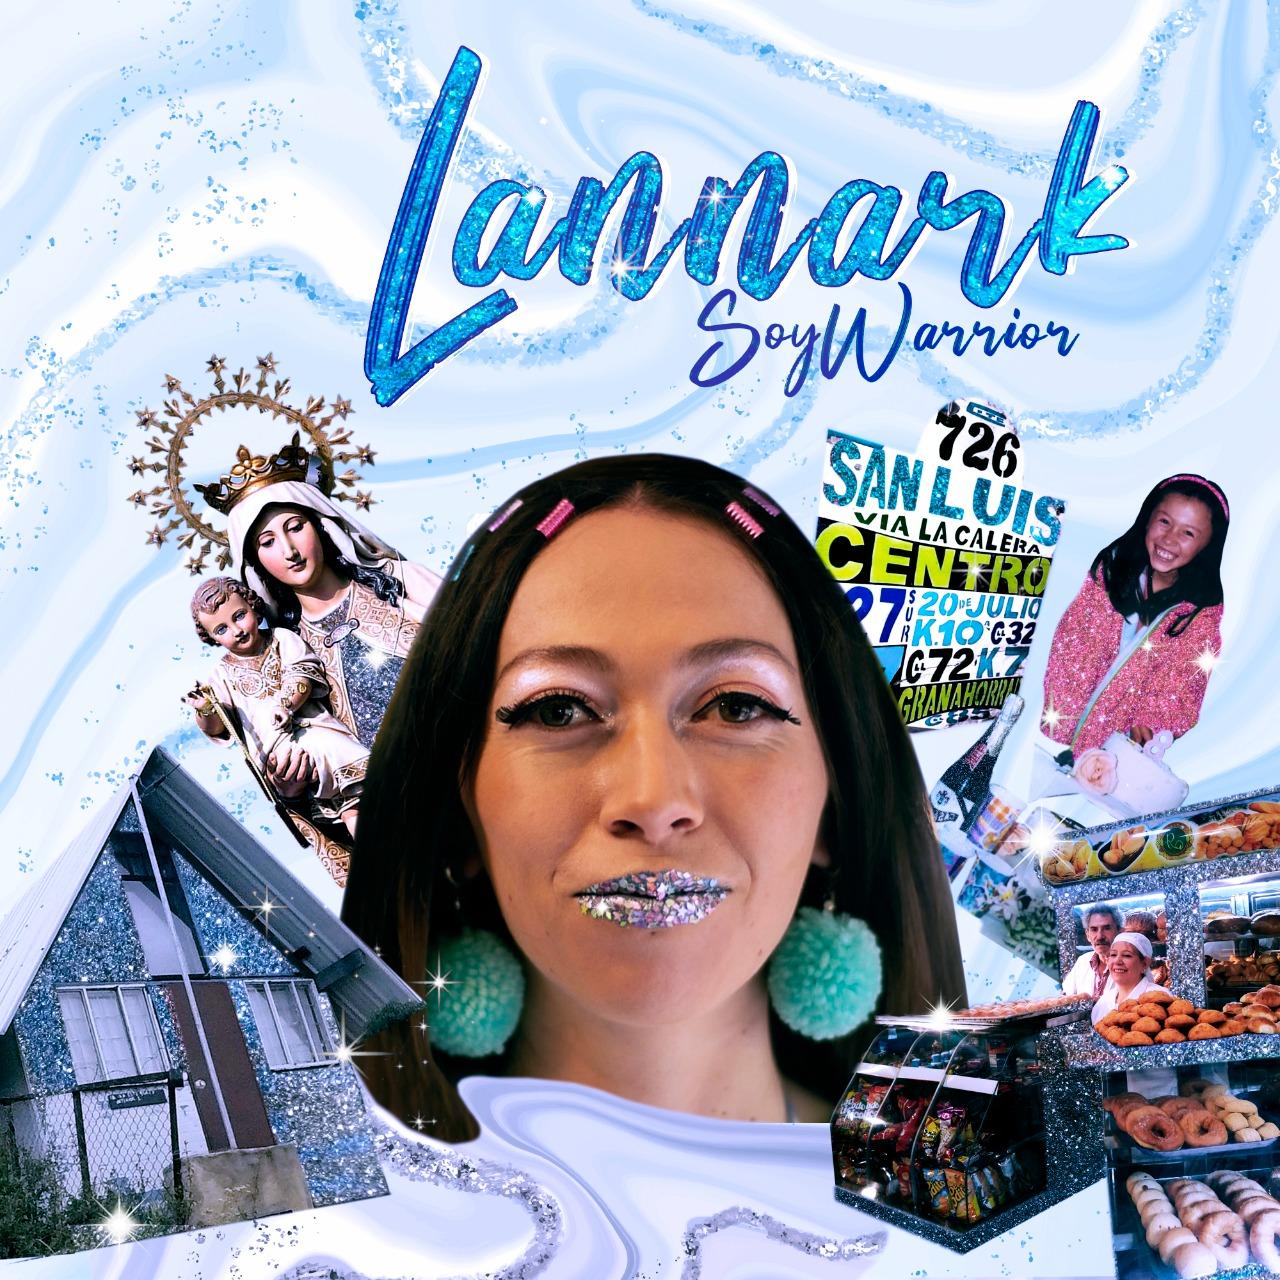 lannark soy warrior lectora de tracks